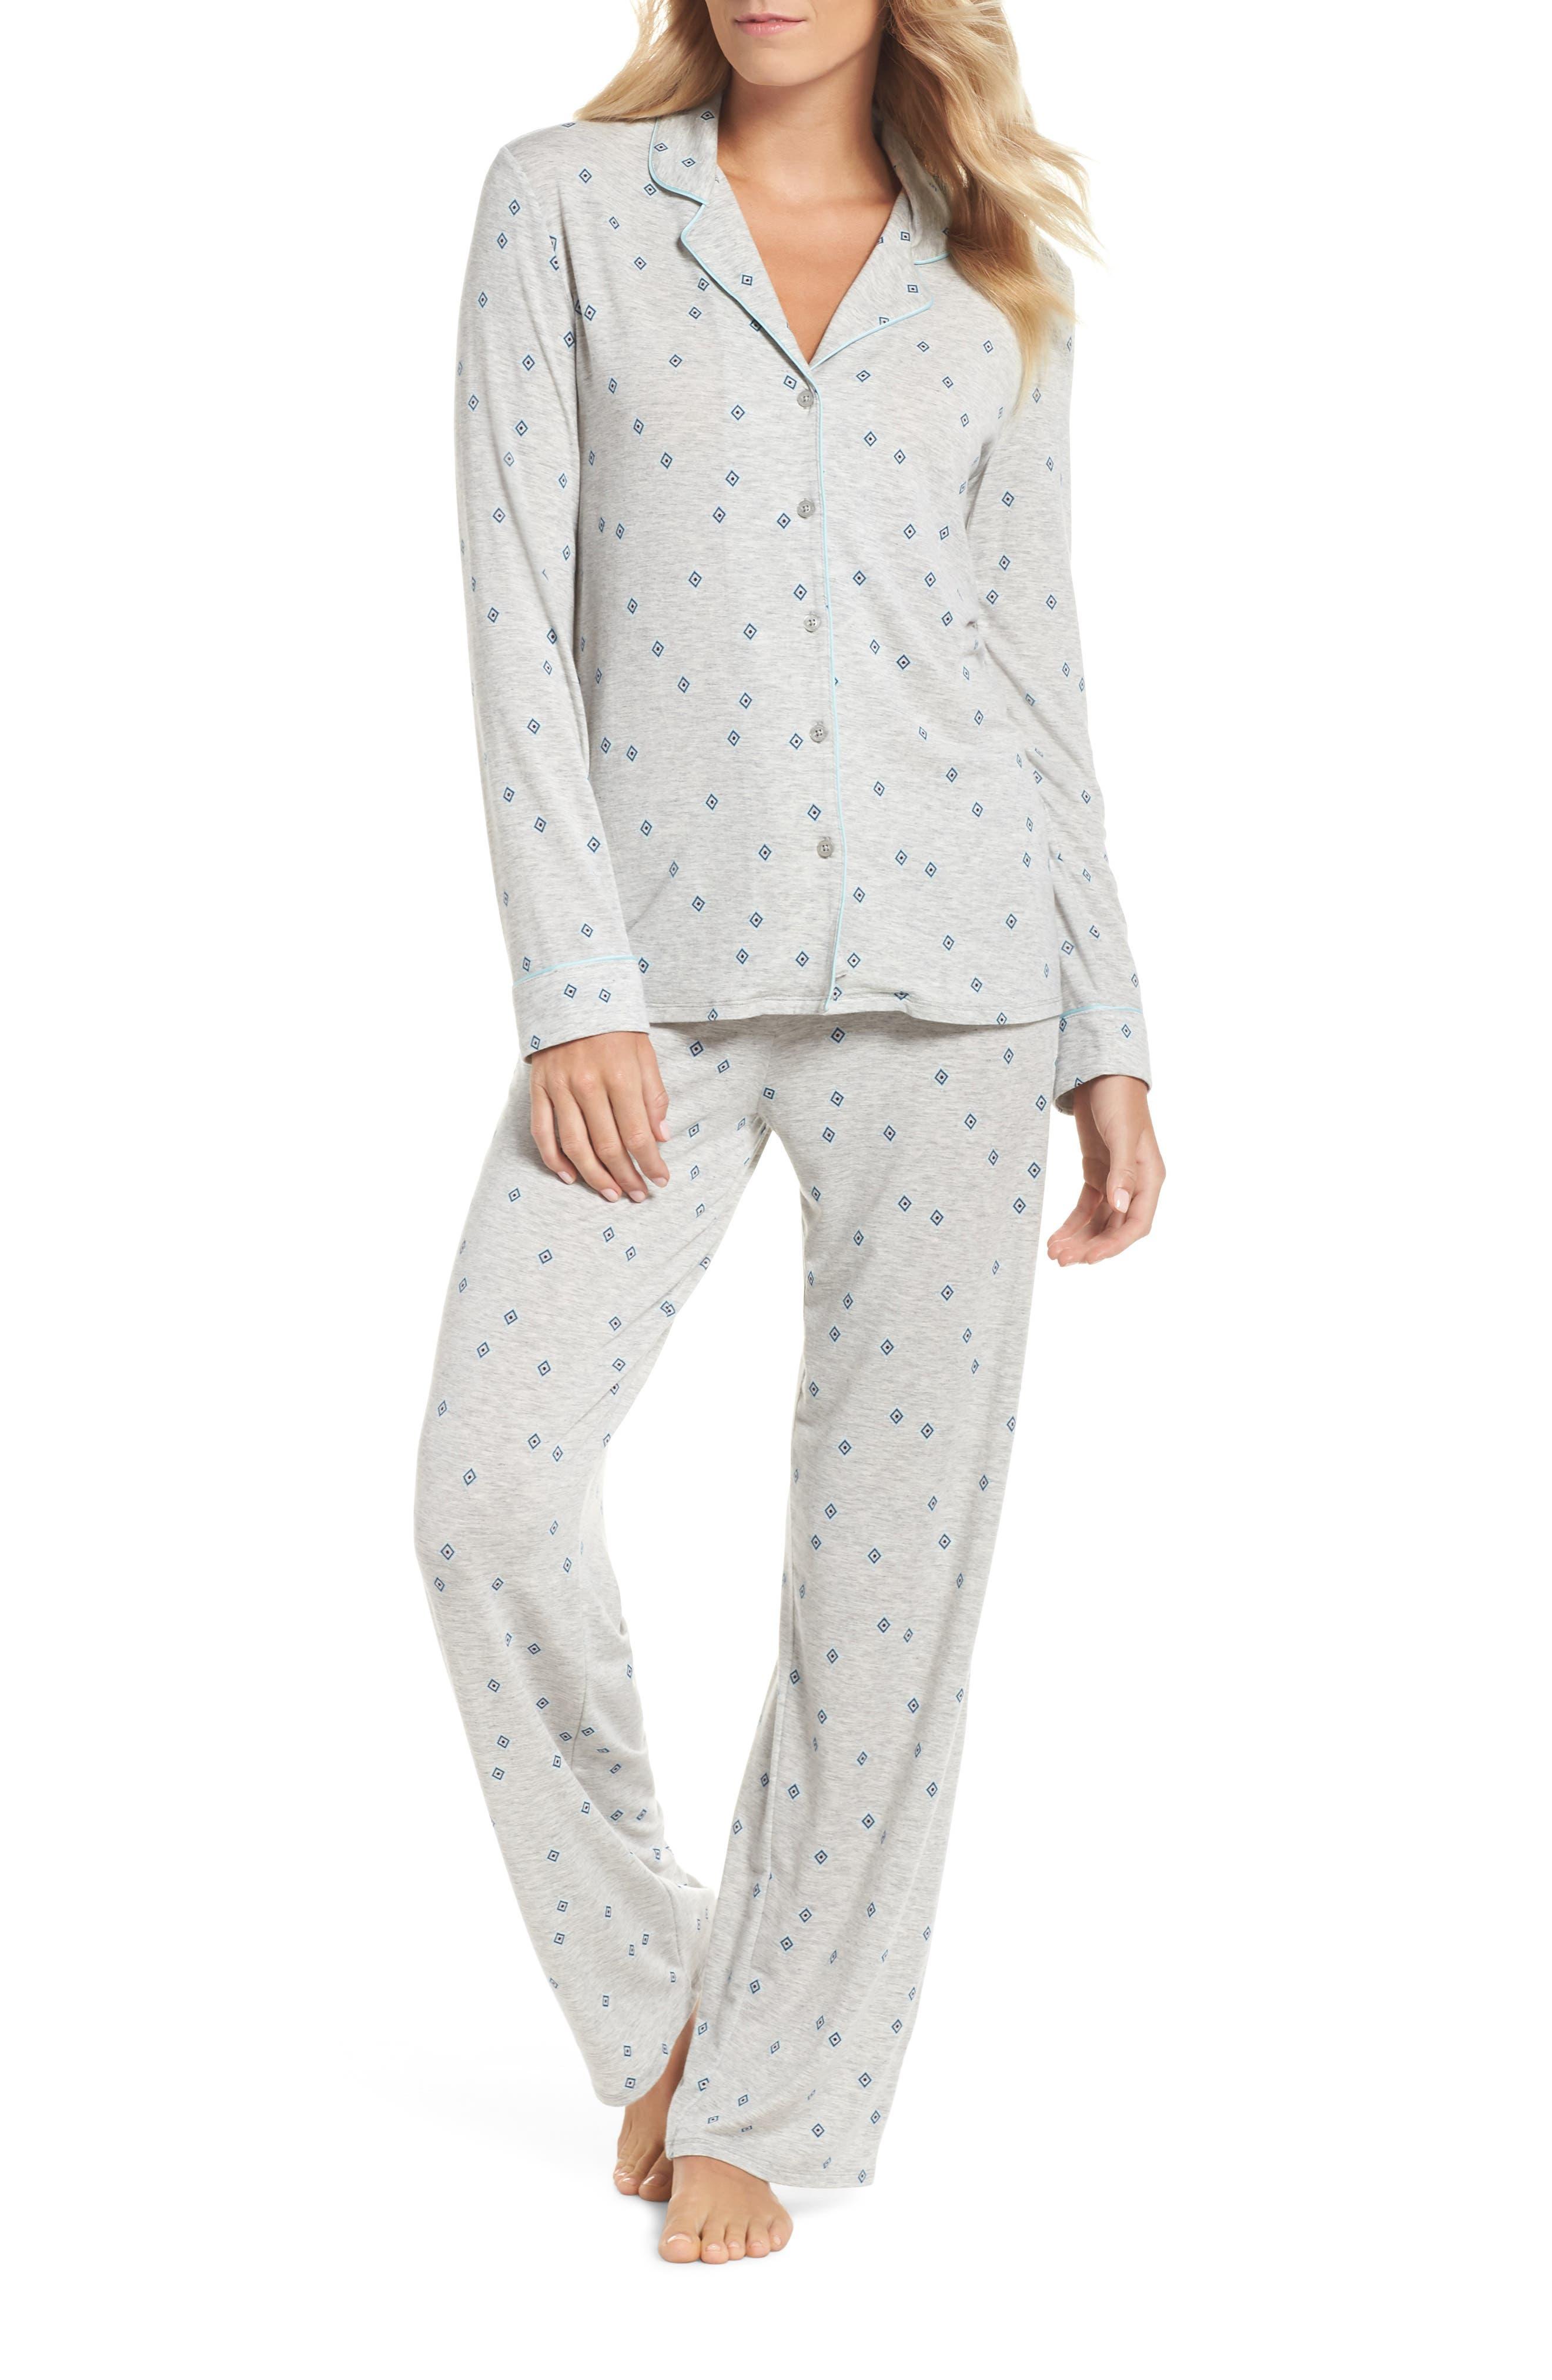 Nordstrom Lingerie Moonlight Pajamas, Grey